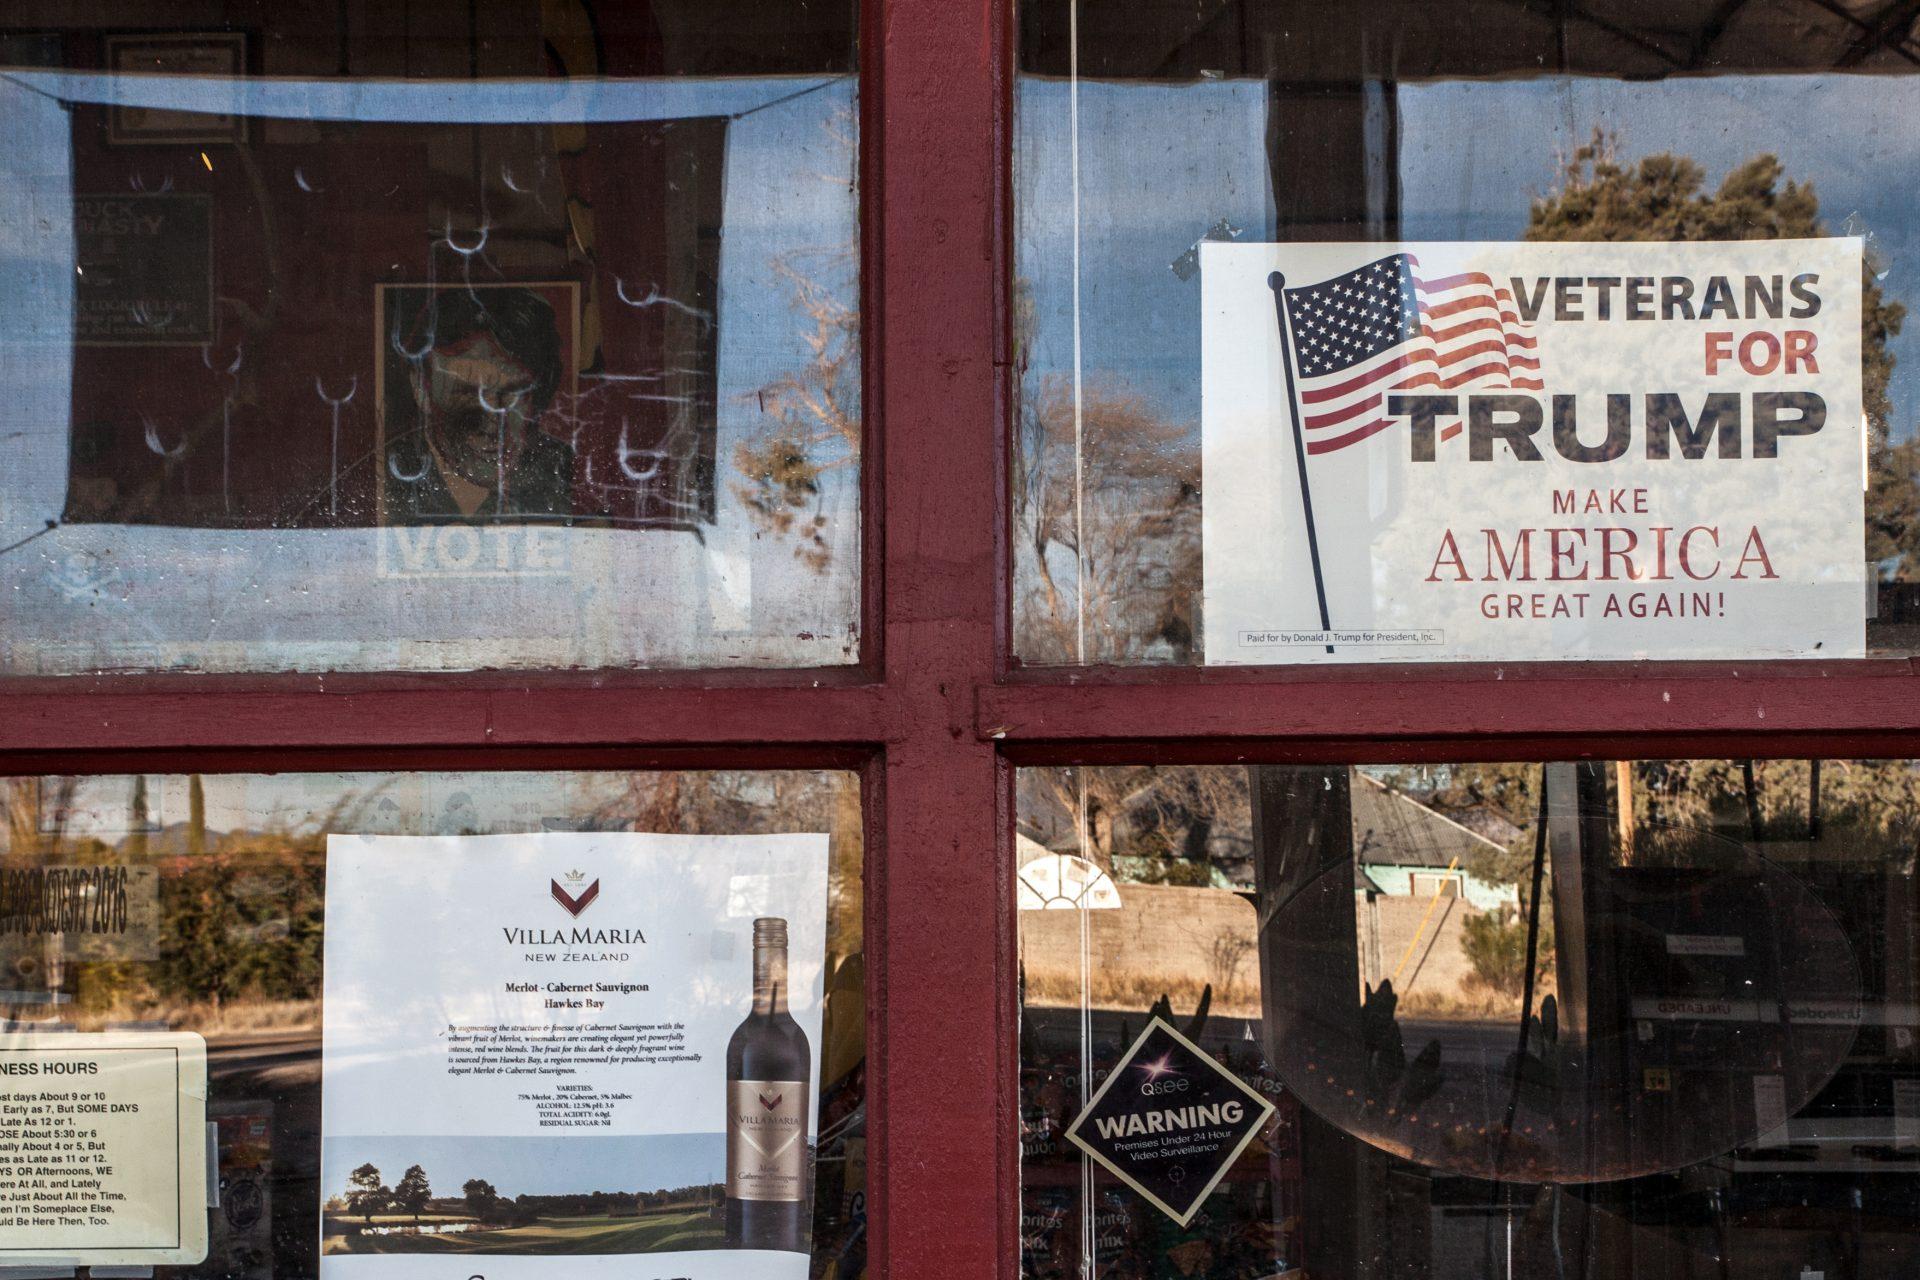 Cochise County bei Douglas ist Trumpland: Hier stimmten 58 Proze